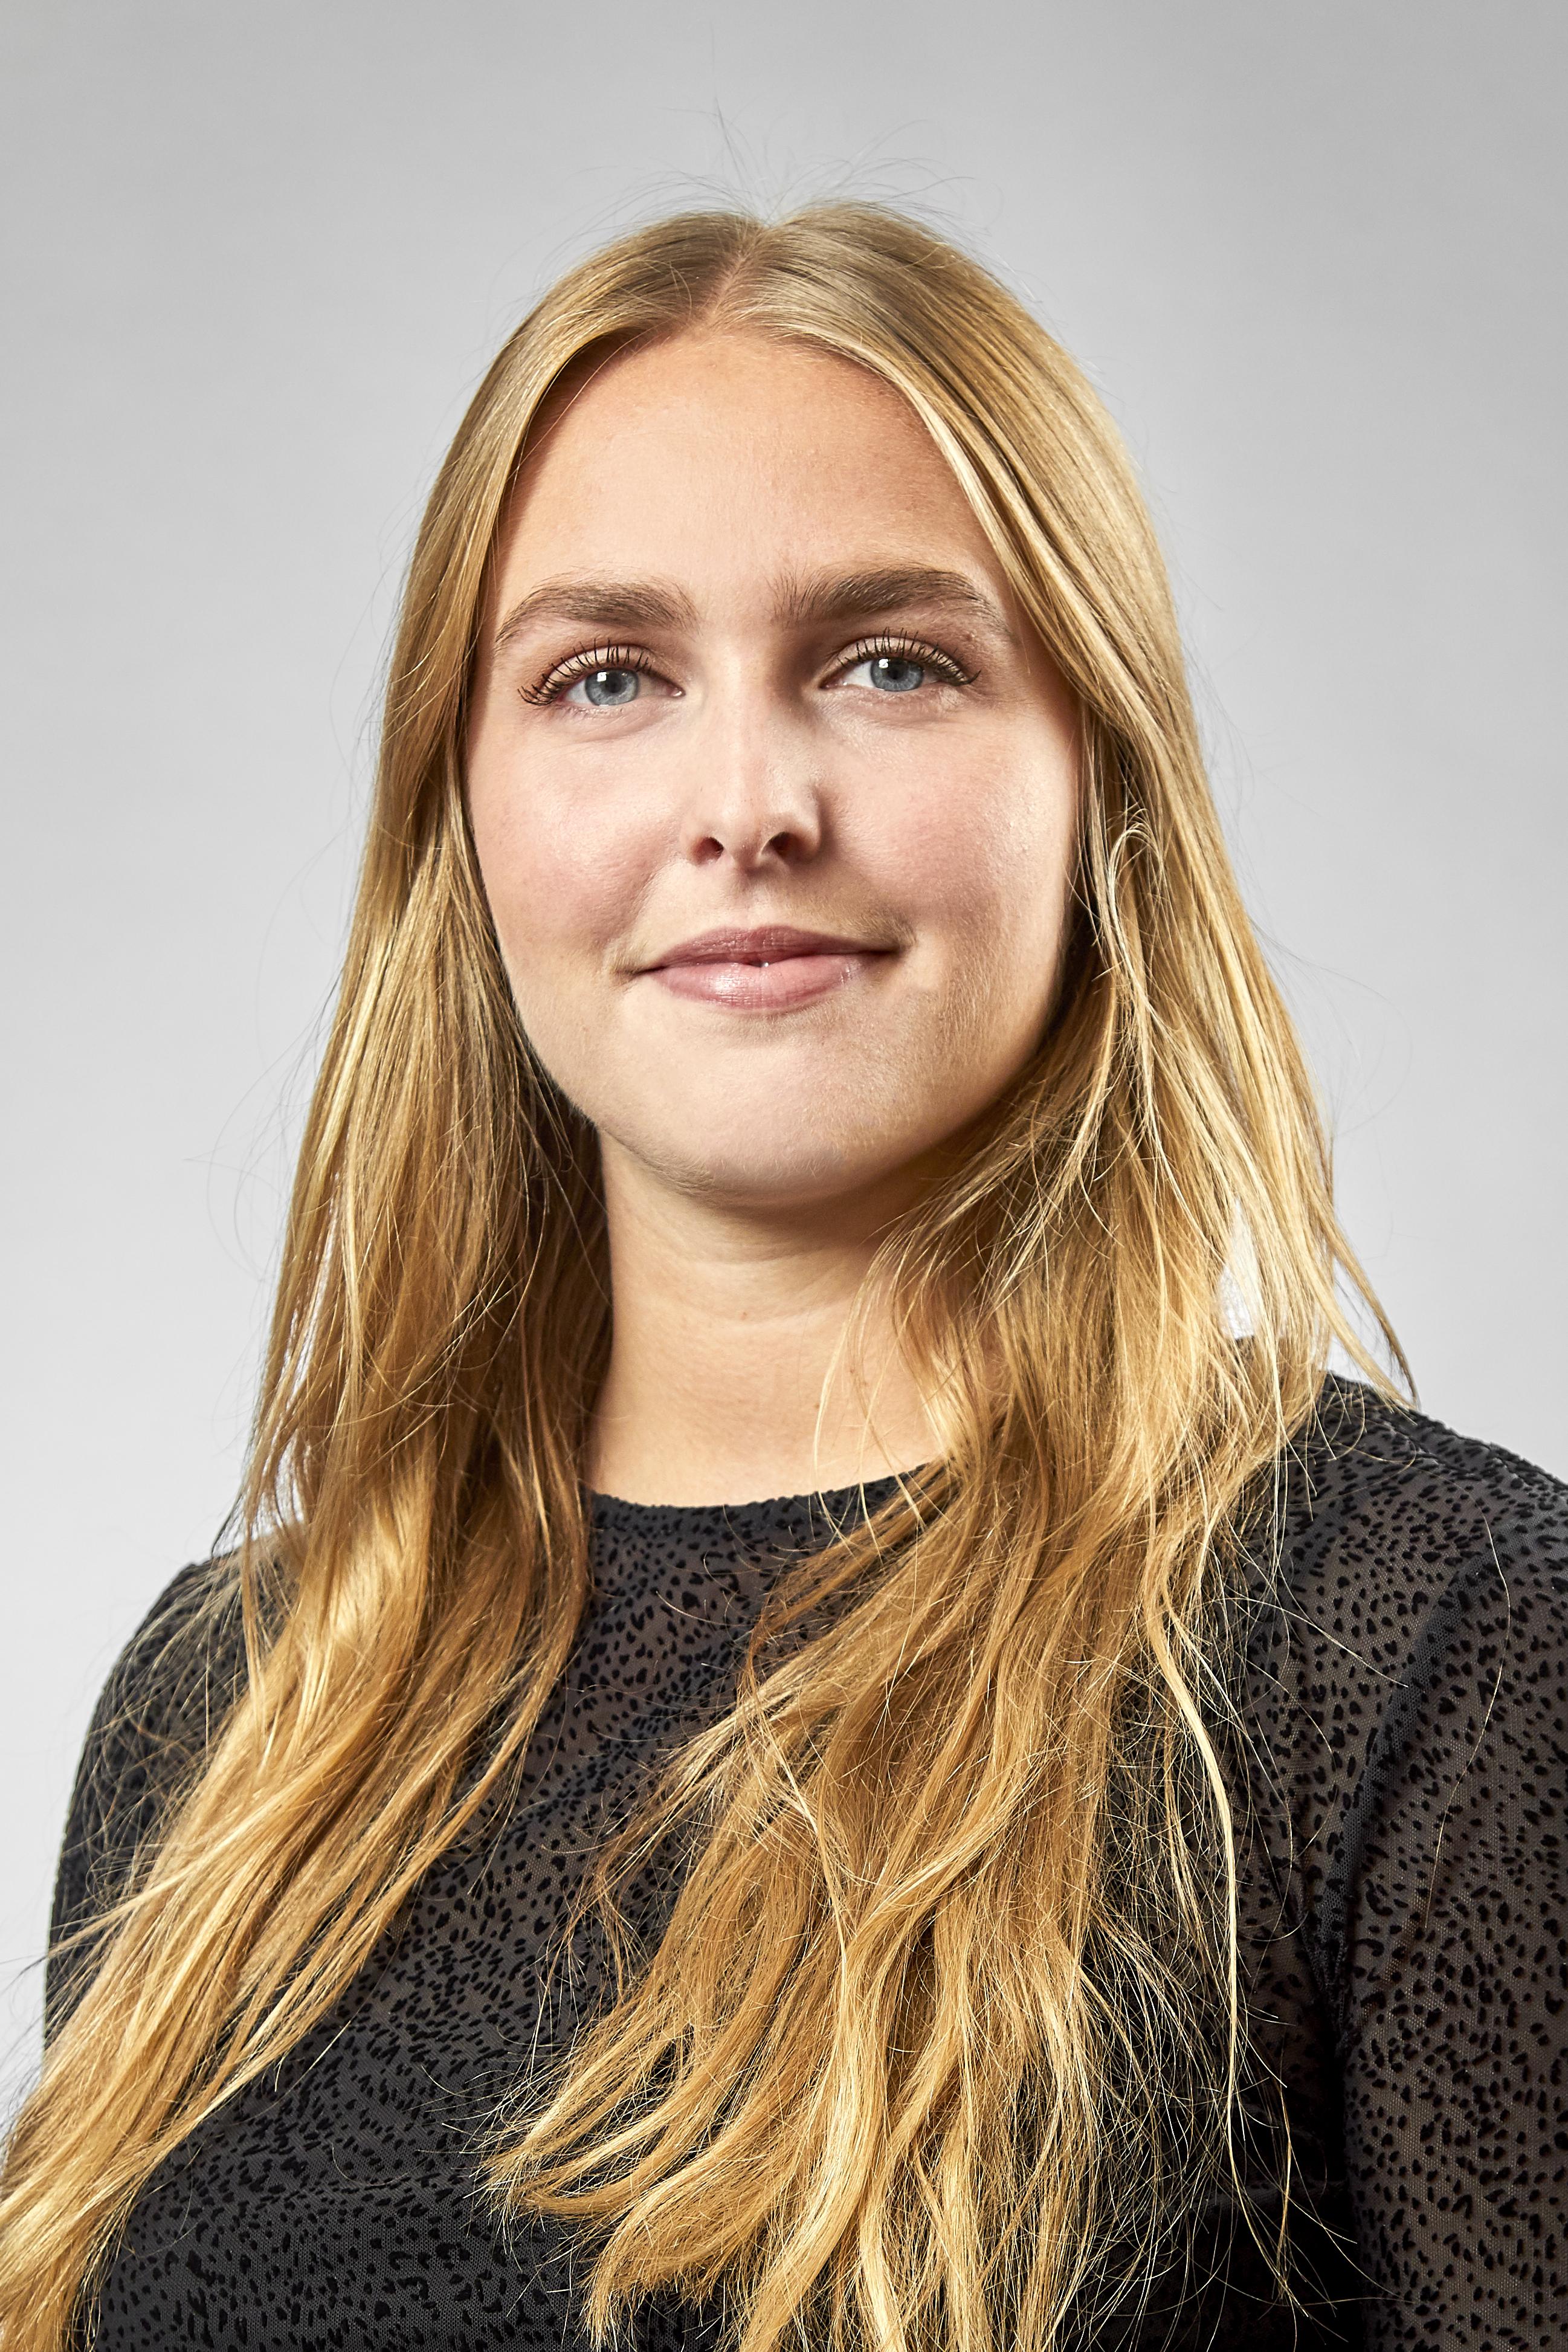 Marie-Louise Bagger Ersgard